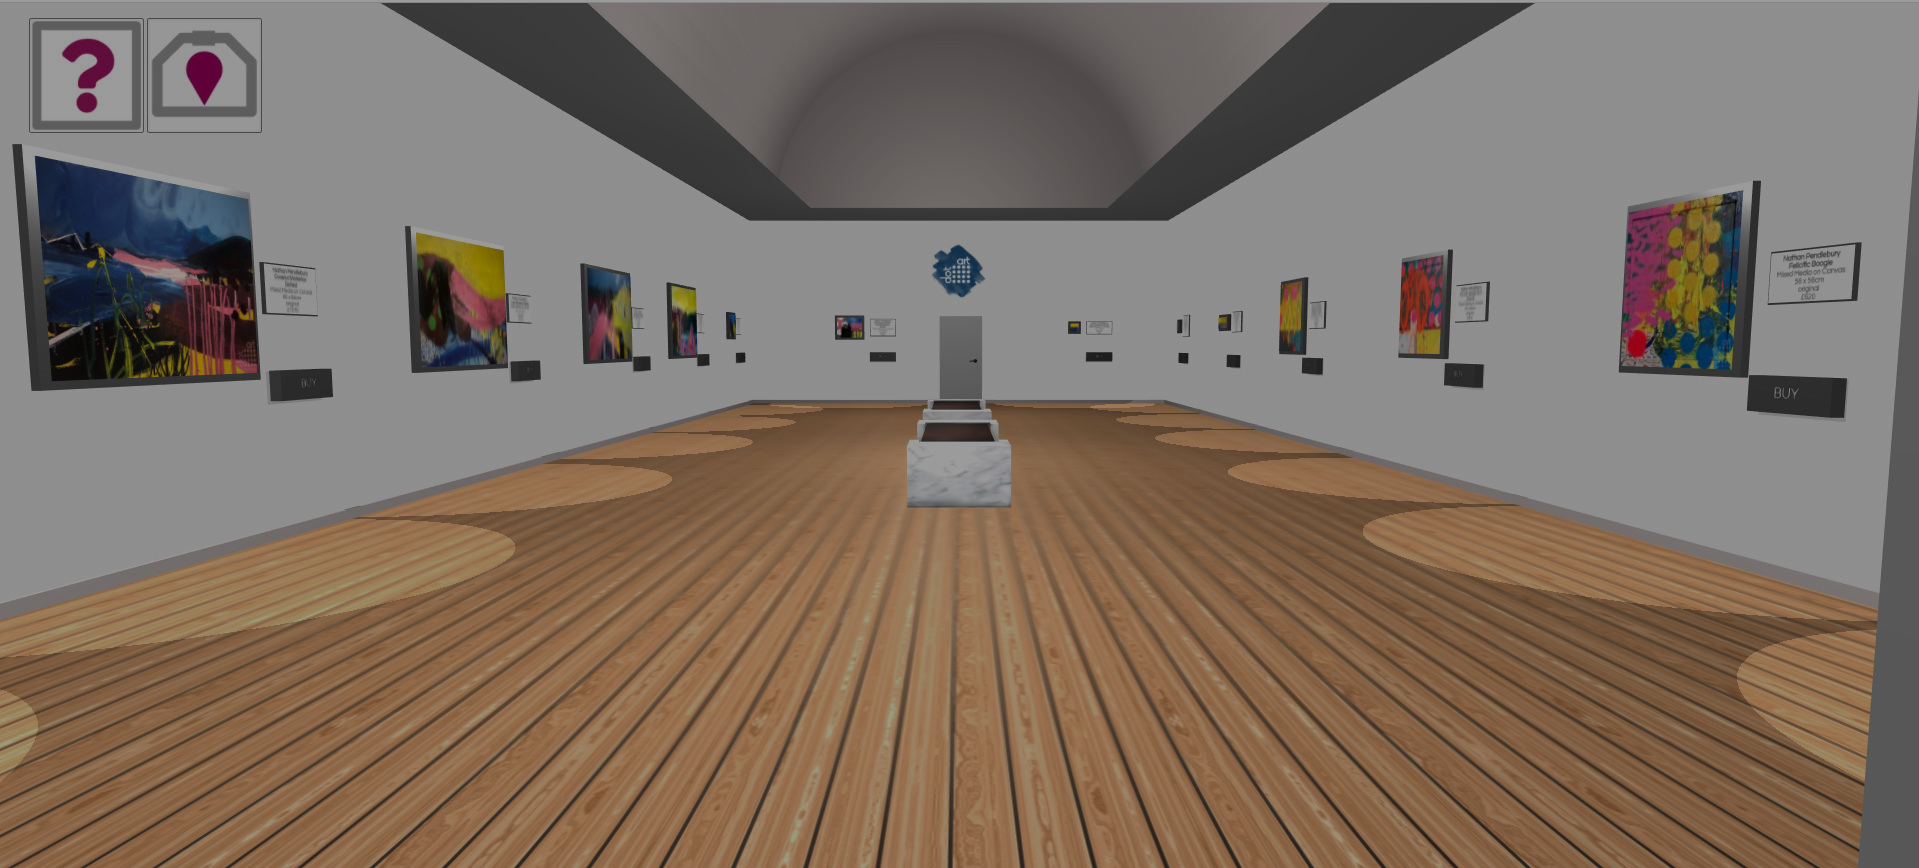 dot-art Virtual Gallery